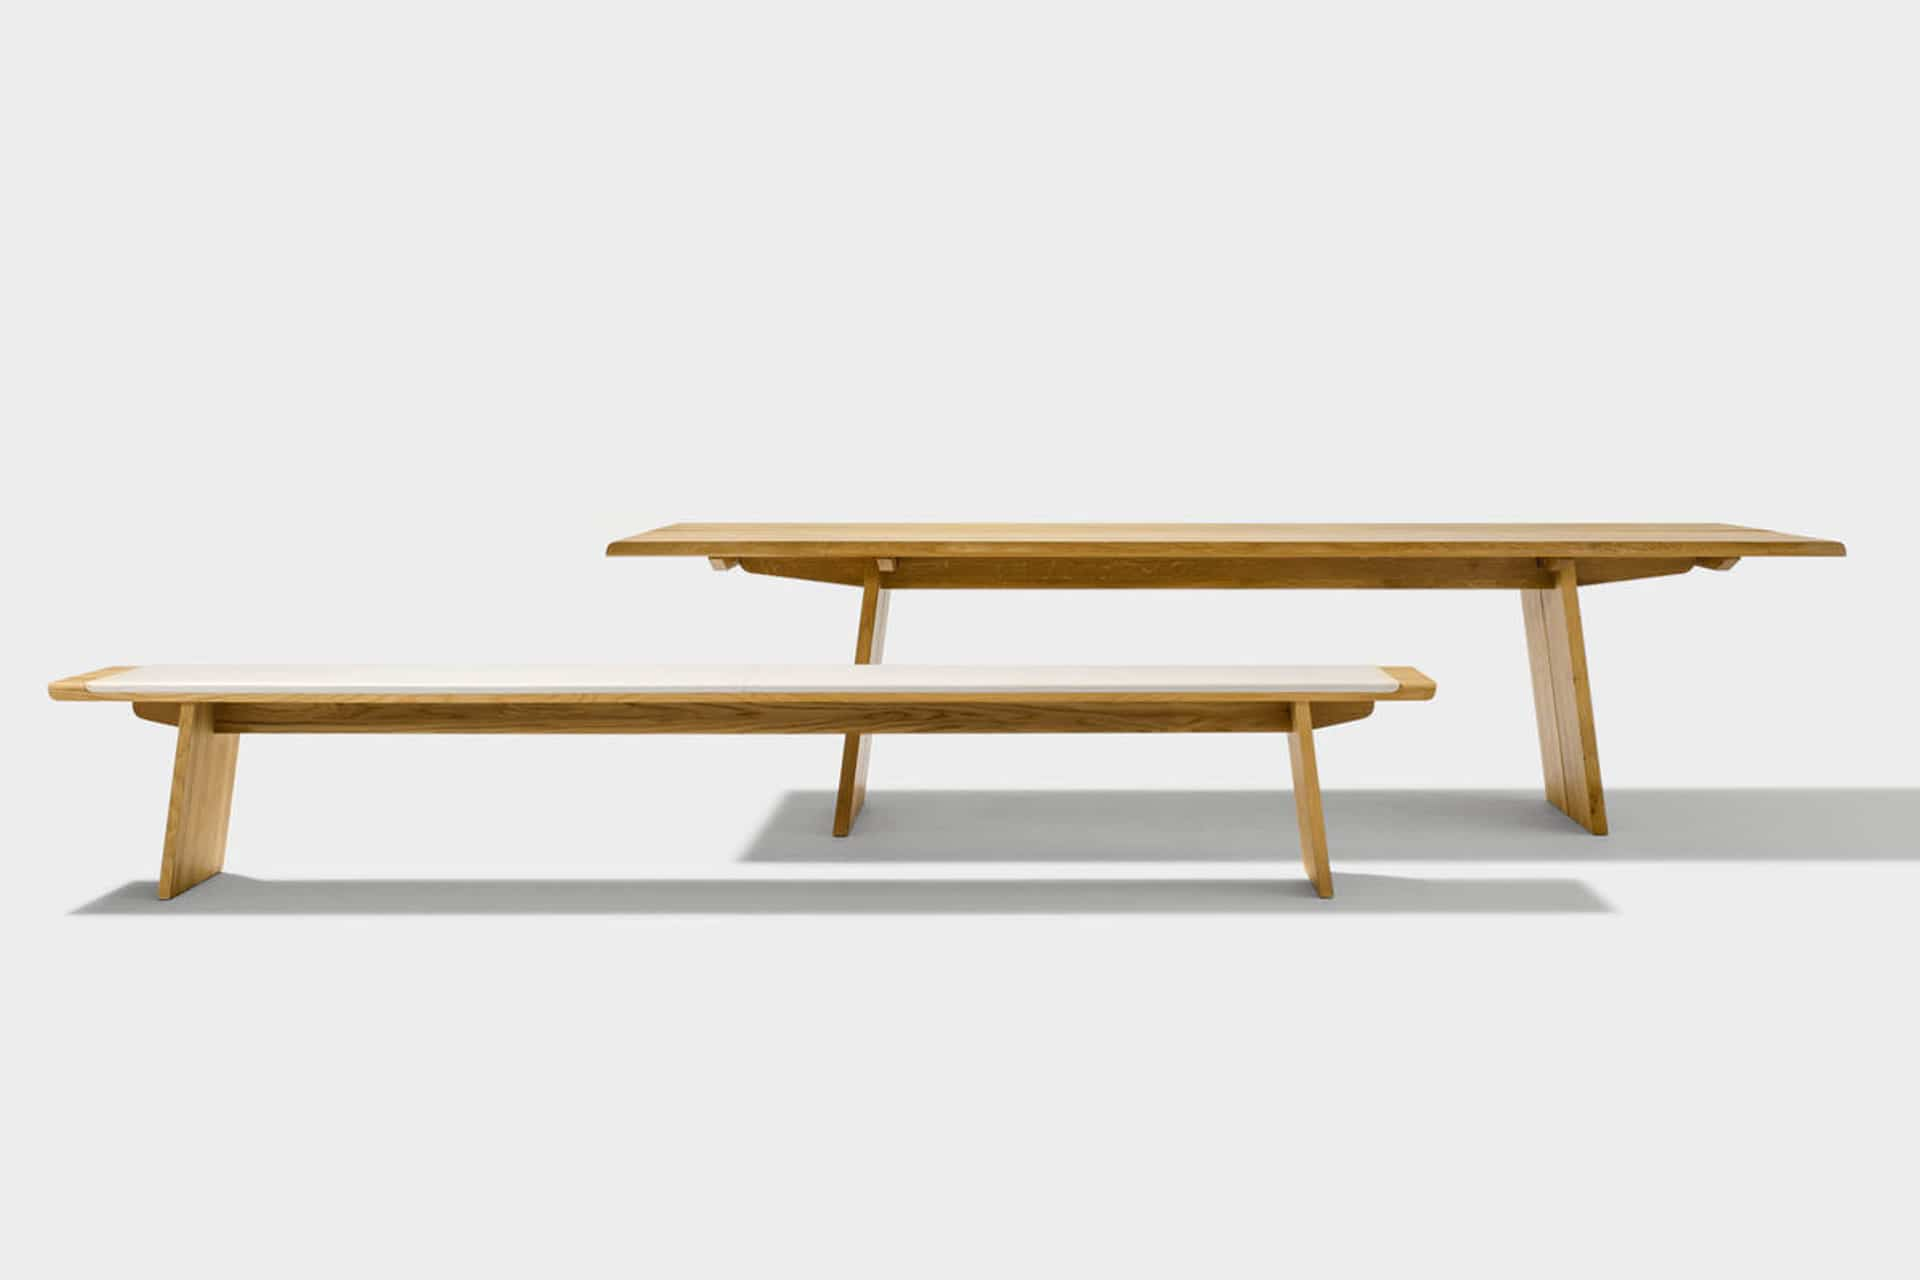 bank nox mit holzwangen kohler nat rlich einrichten naturholzm bel team 7 naturm bel. Black Bedroom Furniture Sets. Home Design Ideas